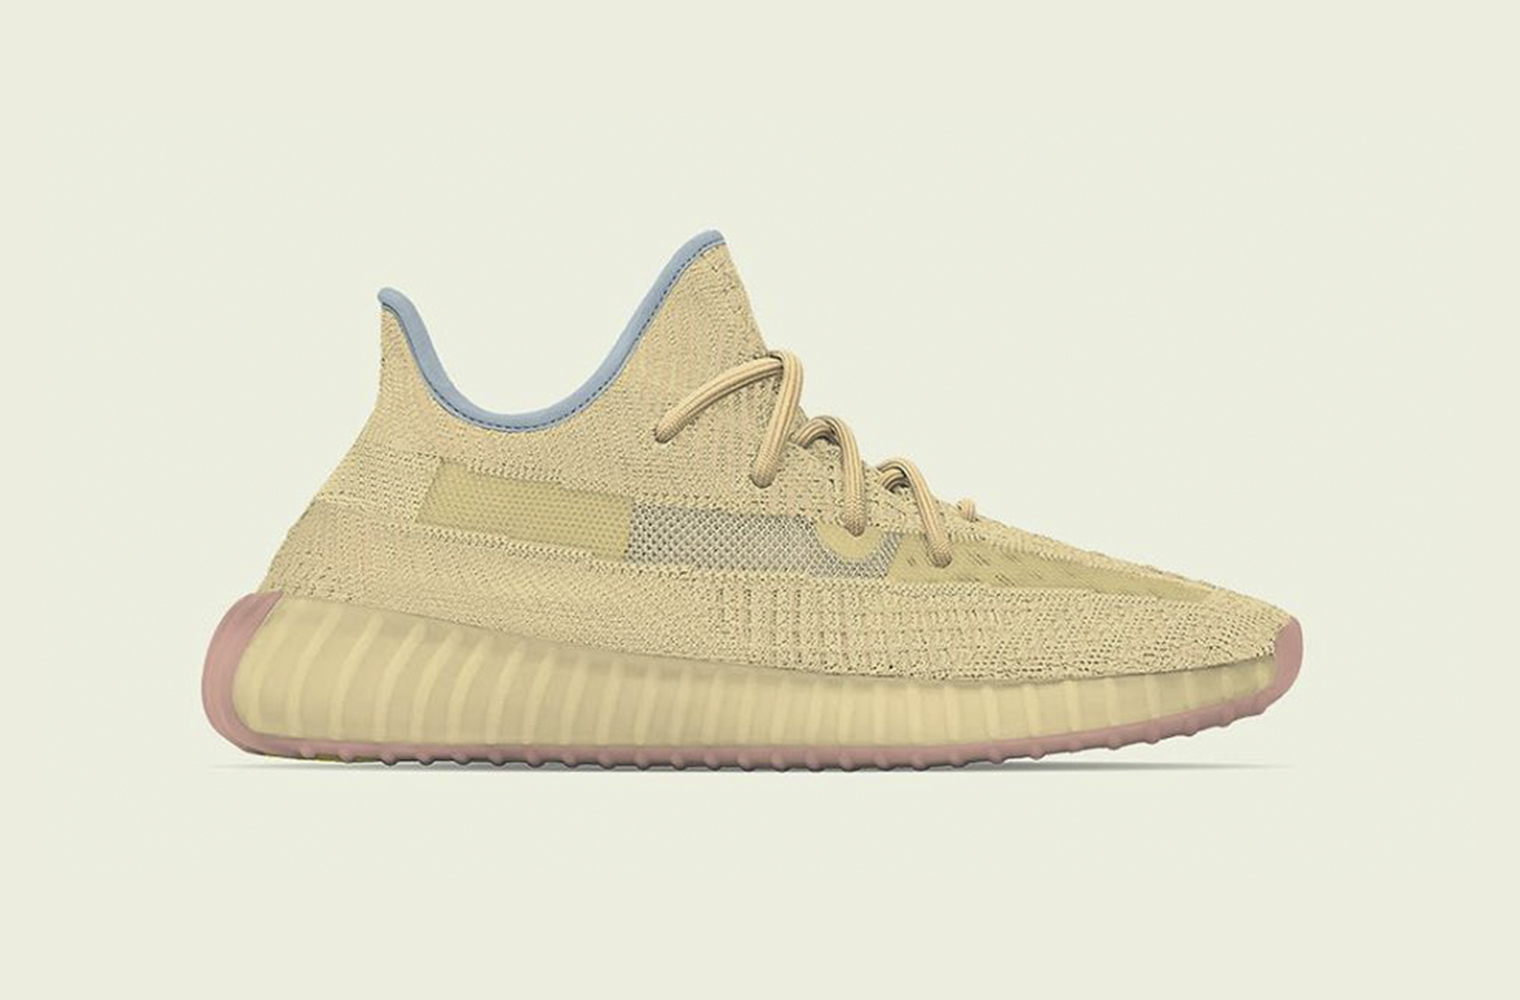 adidas Yeezy Boost 350 V2 «Linen»